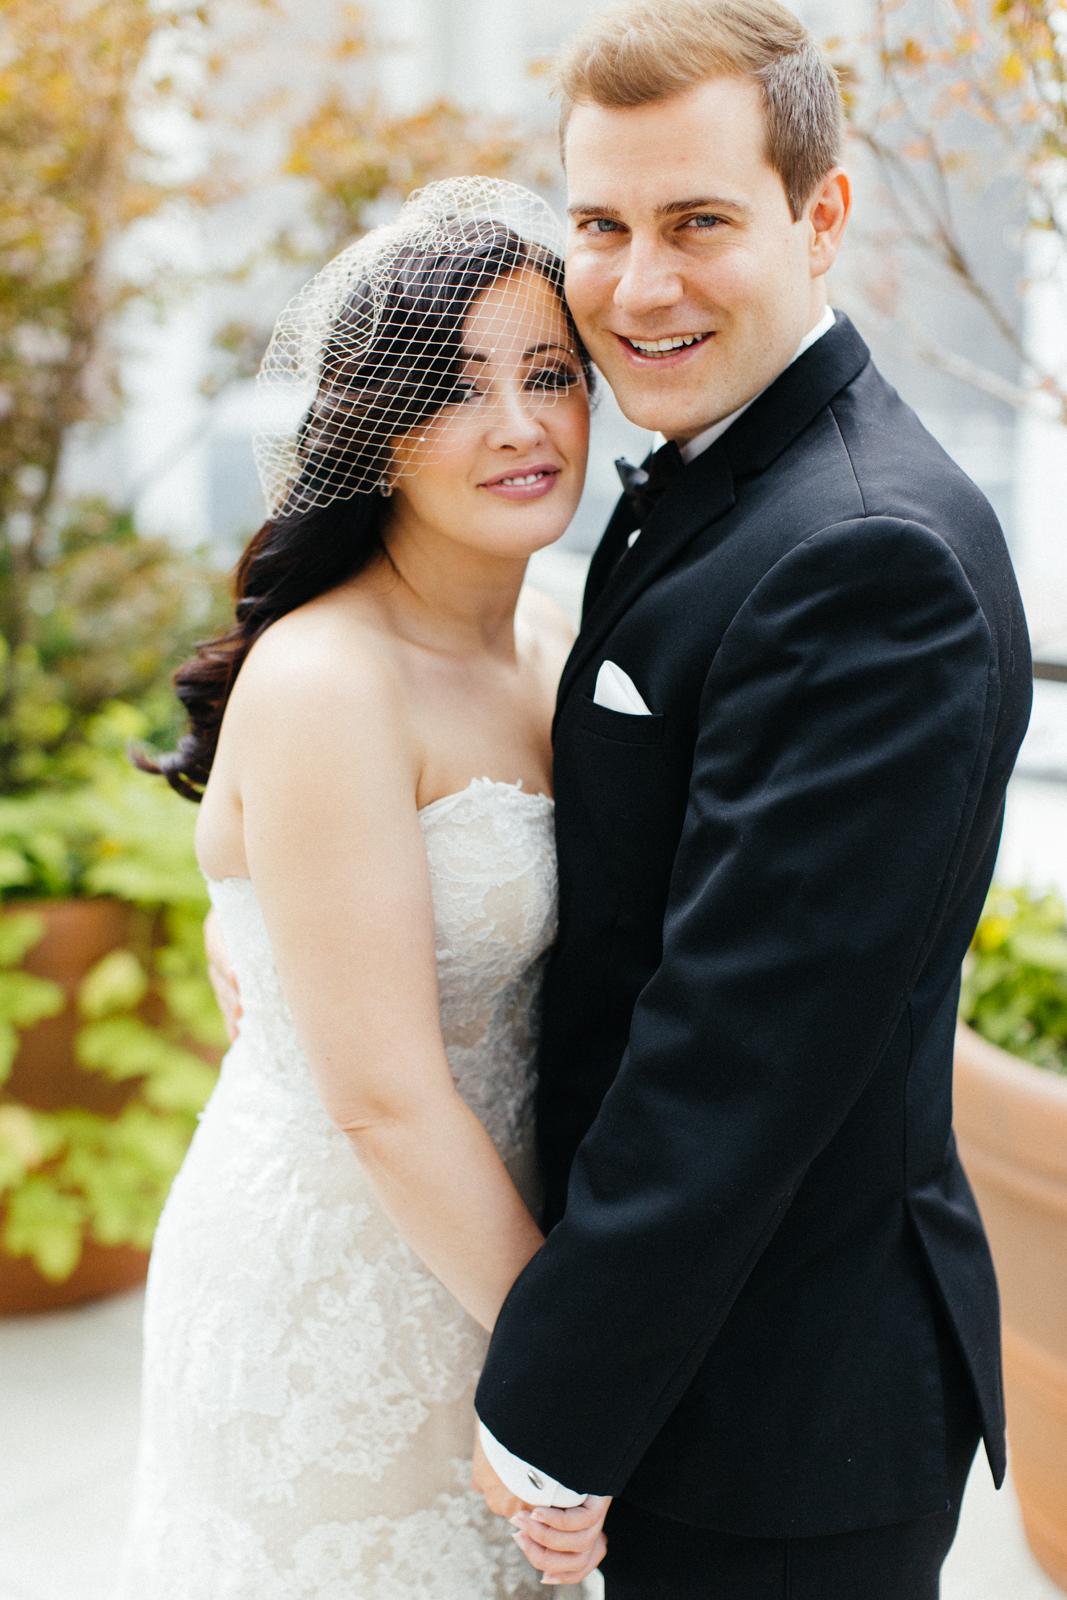 NYC Wedding Photography Lofts at Prince Brooklyn NYC Photographer Boris Zaretsky _B2C7335.jpg